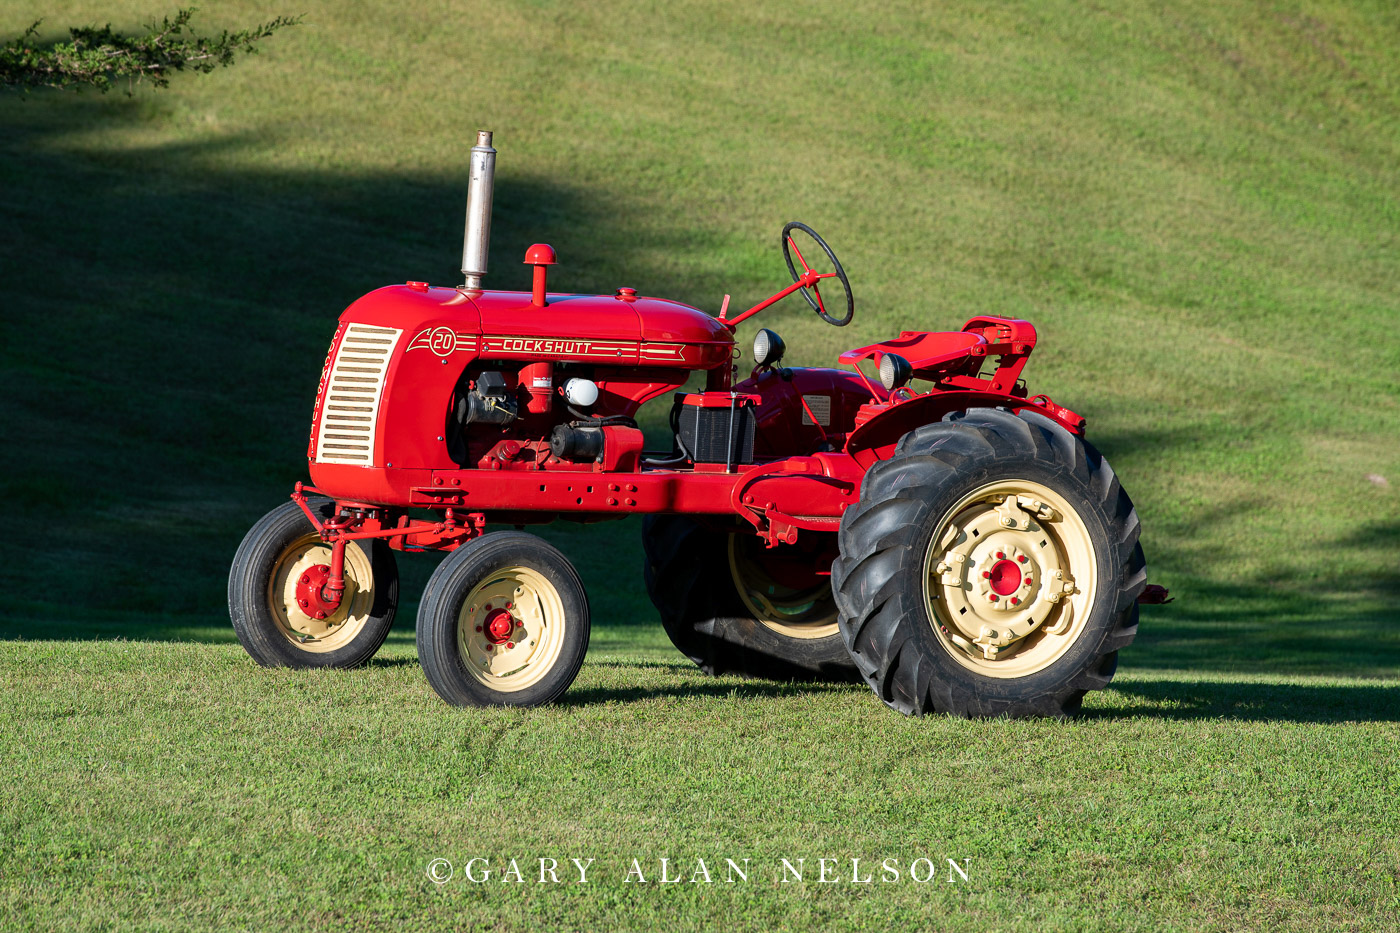 Cockshutt, antique tractor, antique tractors, vintage tractors, photo